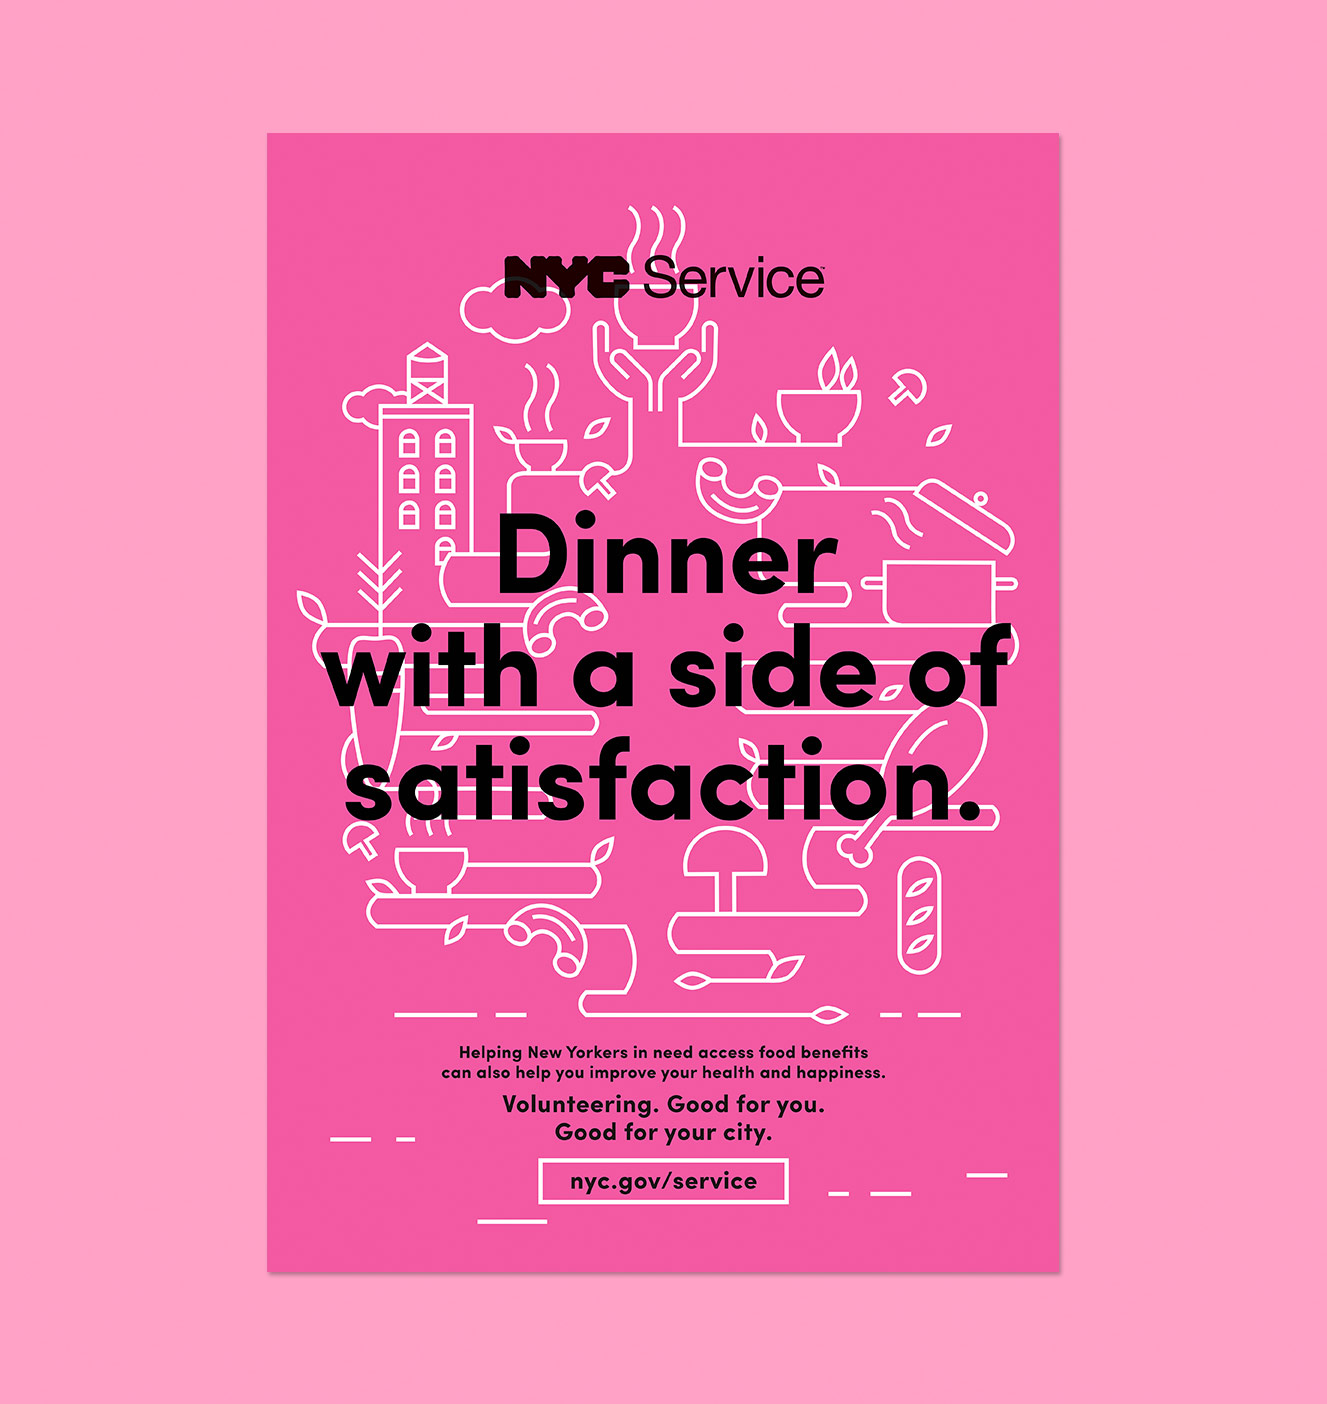 NYC_Service_2018_4